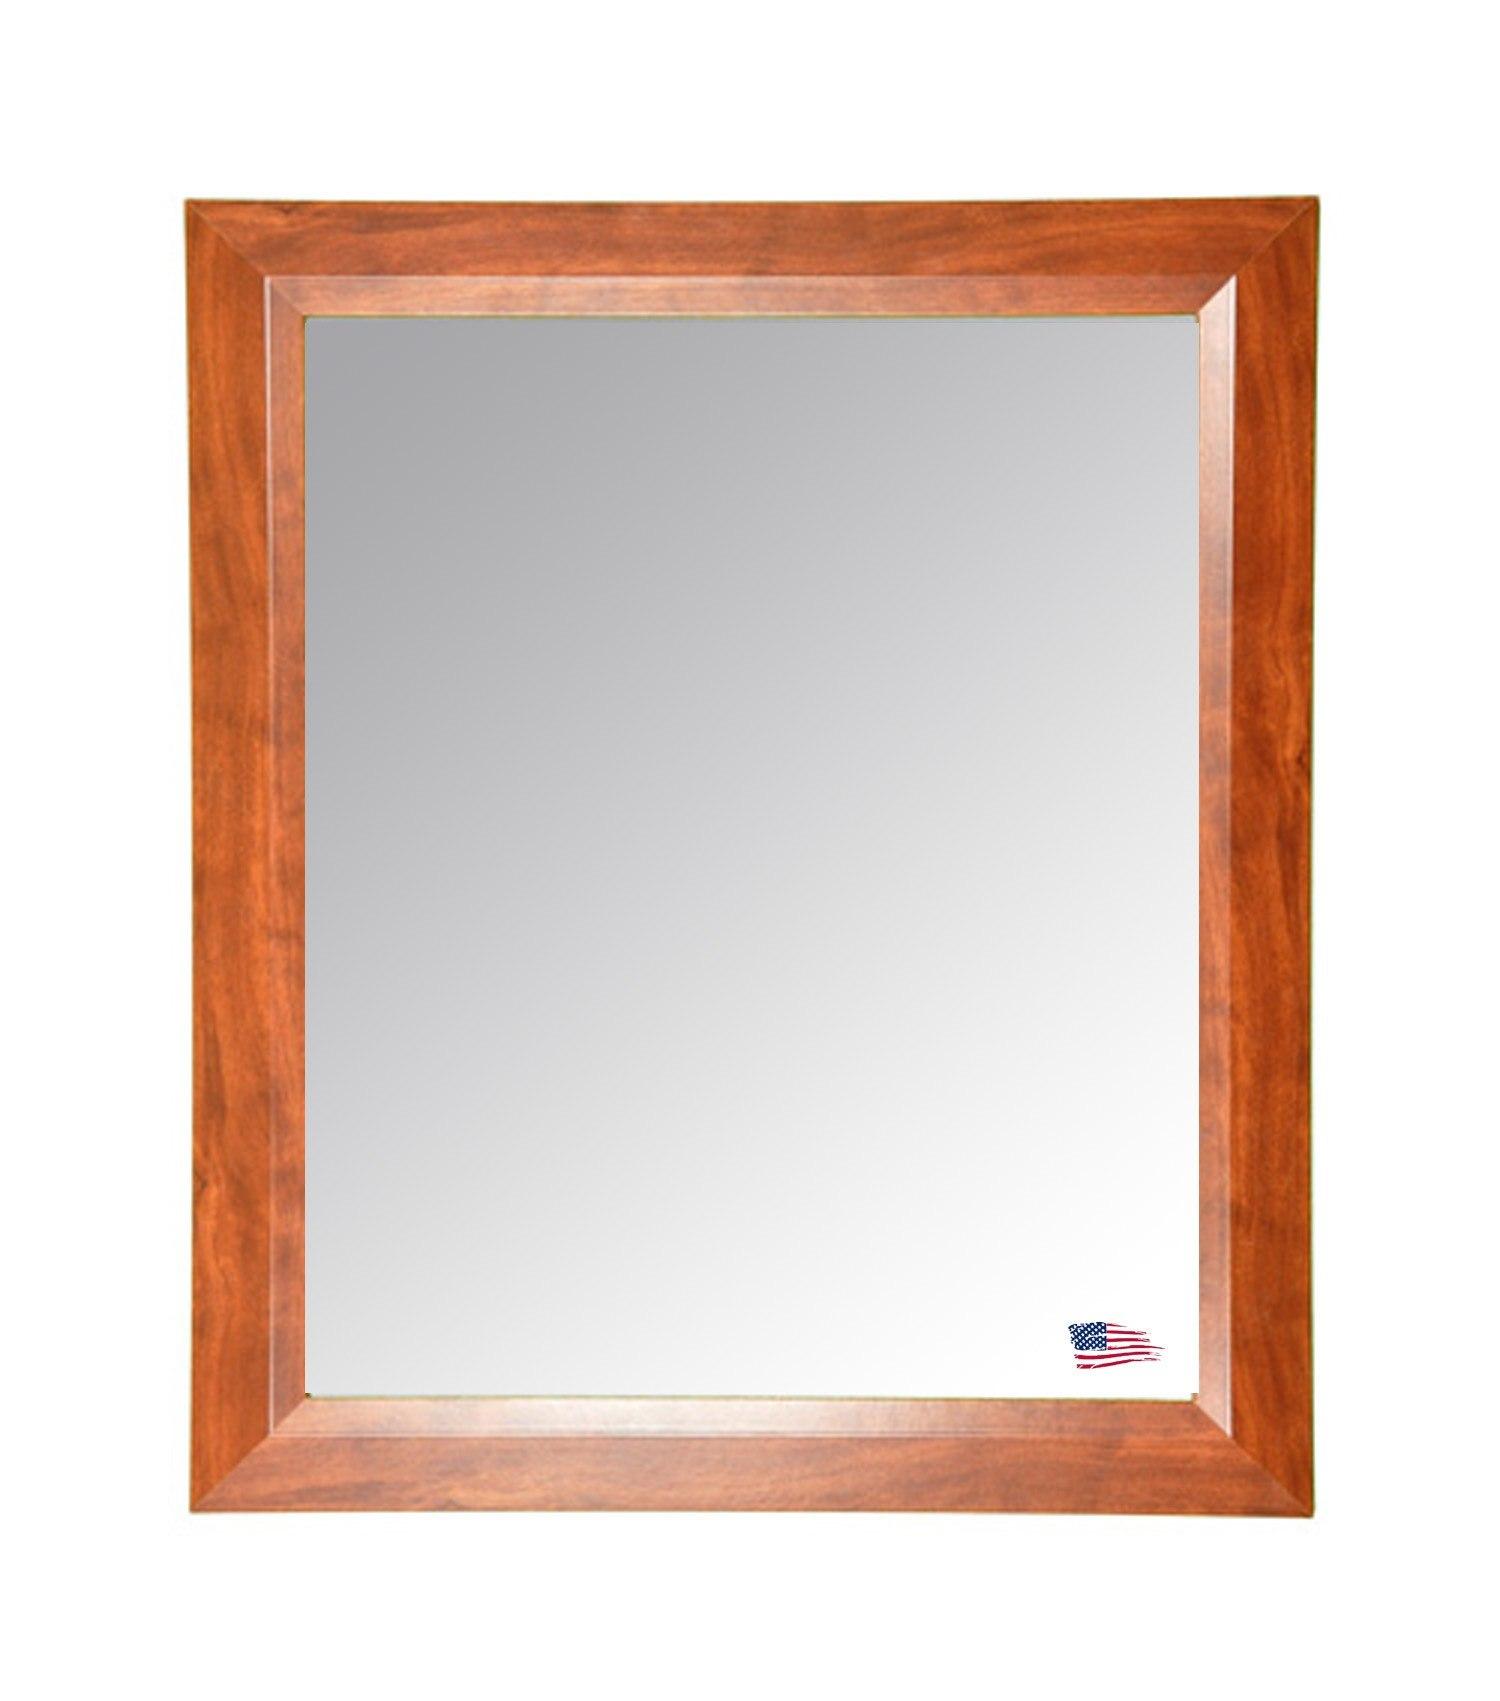 Rayne Mirrors V0016MS 26 x 32 Inch Midwest Walnut Wall Mirror